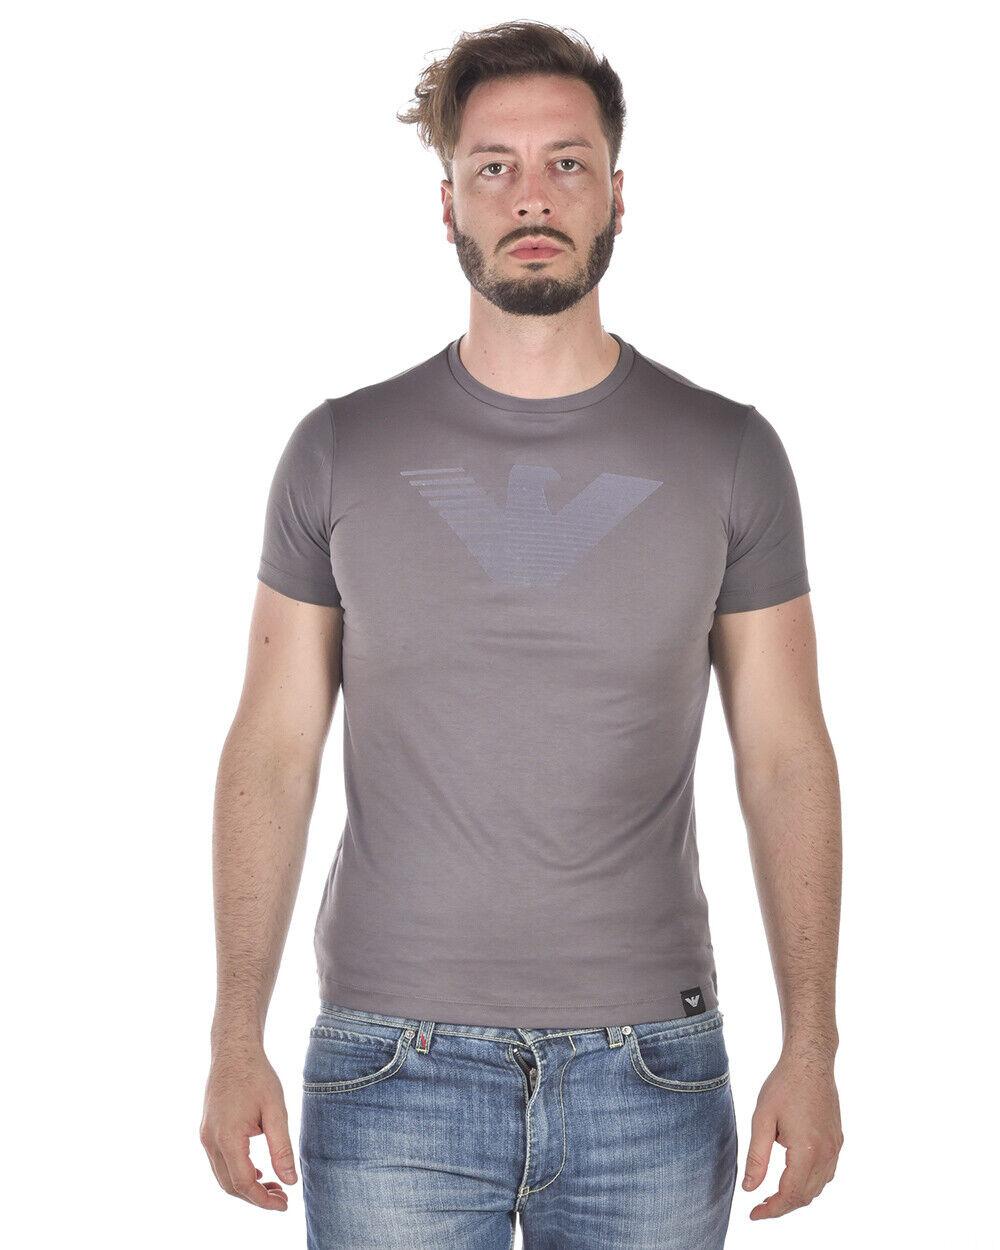 T shirt Maglietta Emporio Armani Sweatshirt Cotone Uomo Grigio 3Z1T651JPRZ 620